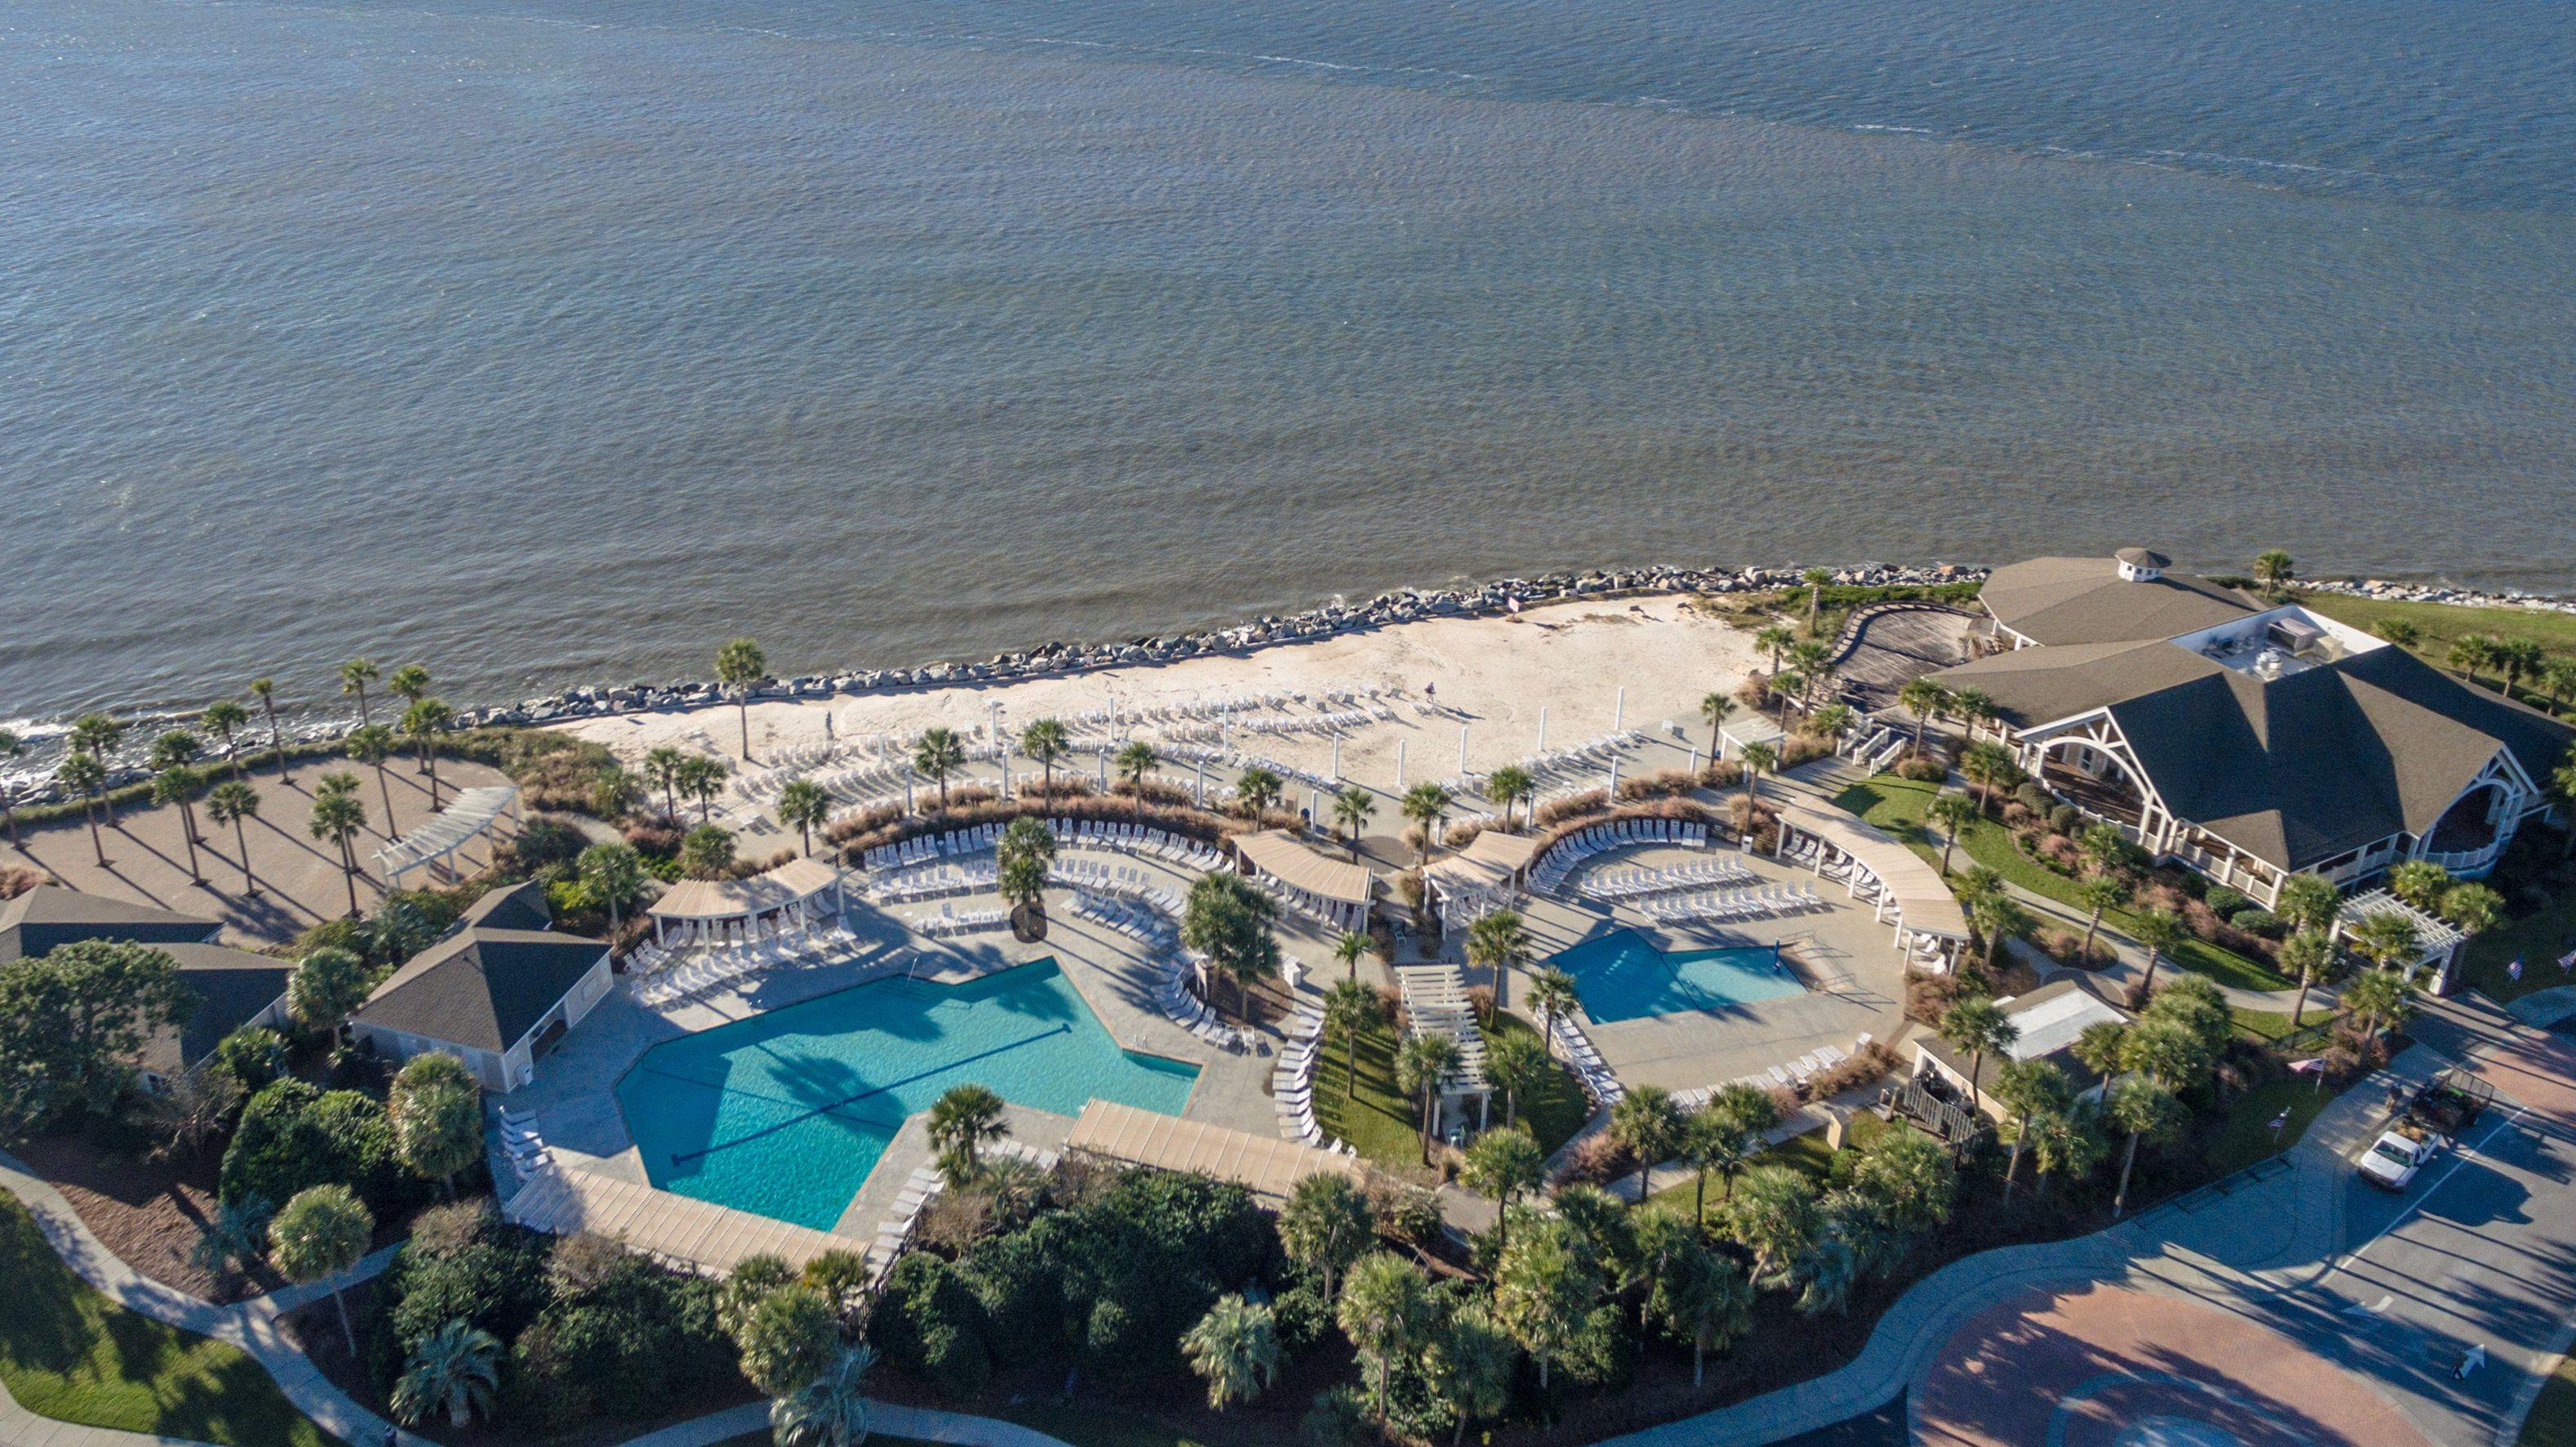 Amazing Aerial View Of The Seabrook Island Beach Club